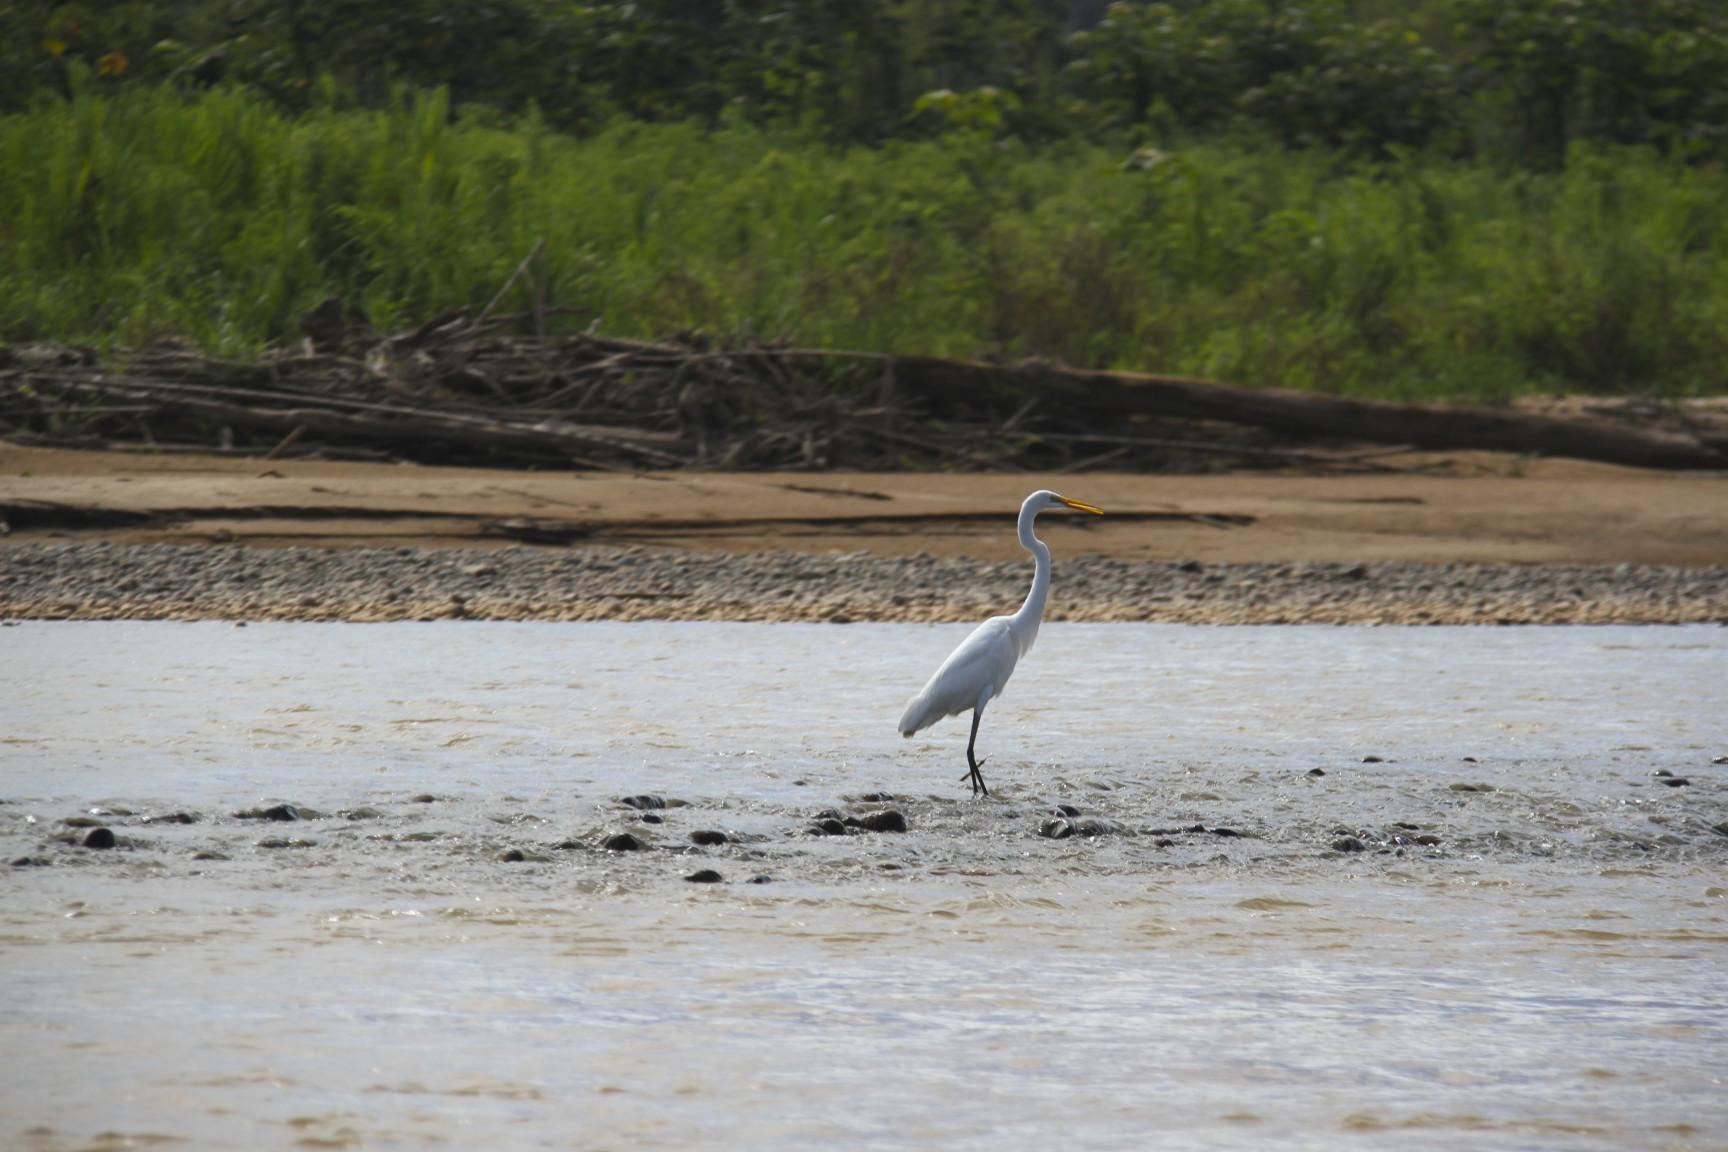 Crane, Rio Beni, Amazon, Bolivia